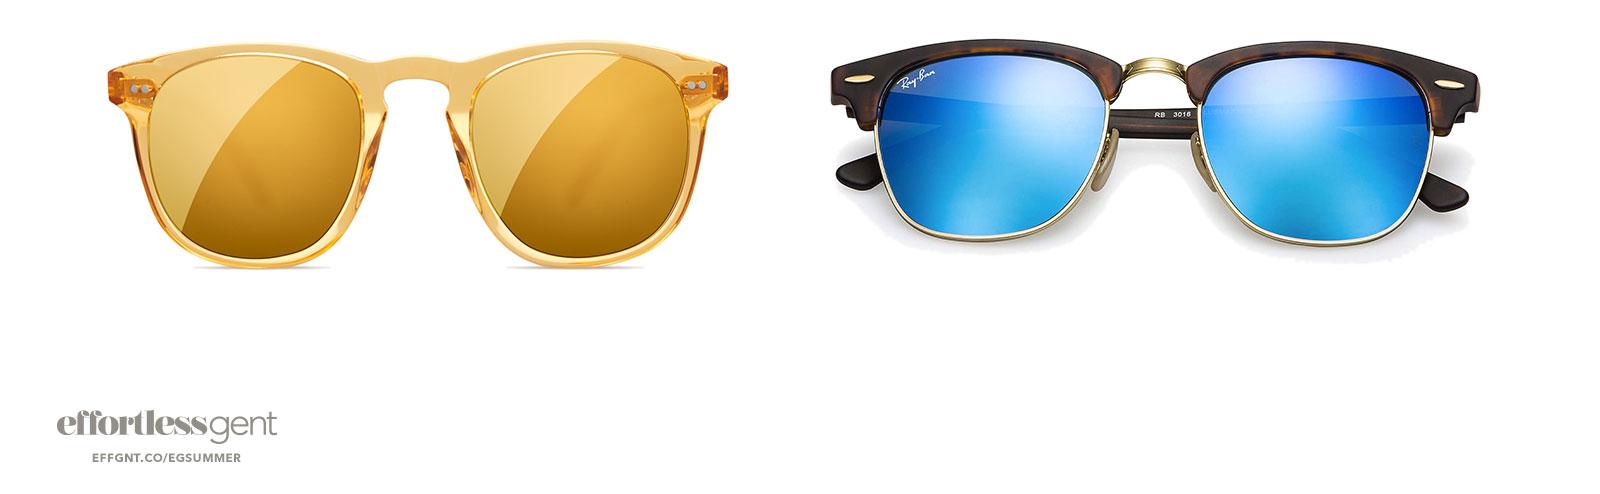 sunglasses - summer clothes for men - effortless gent